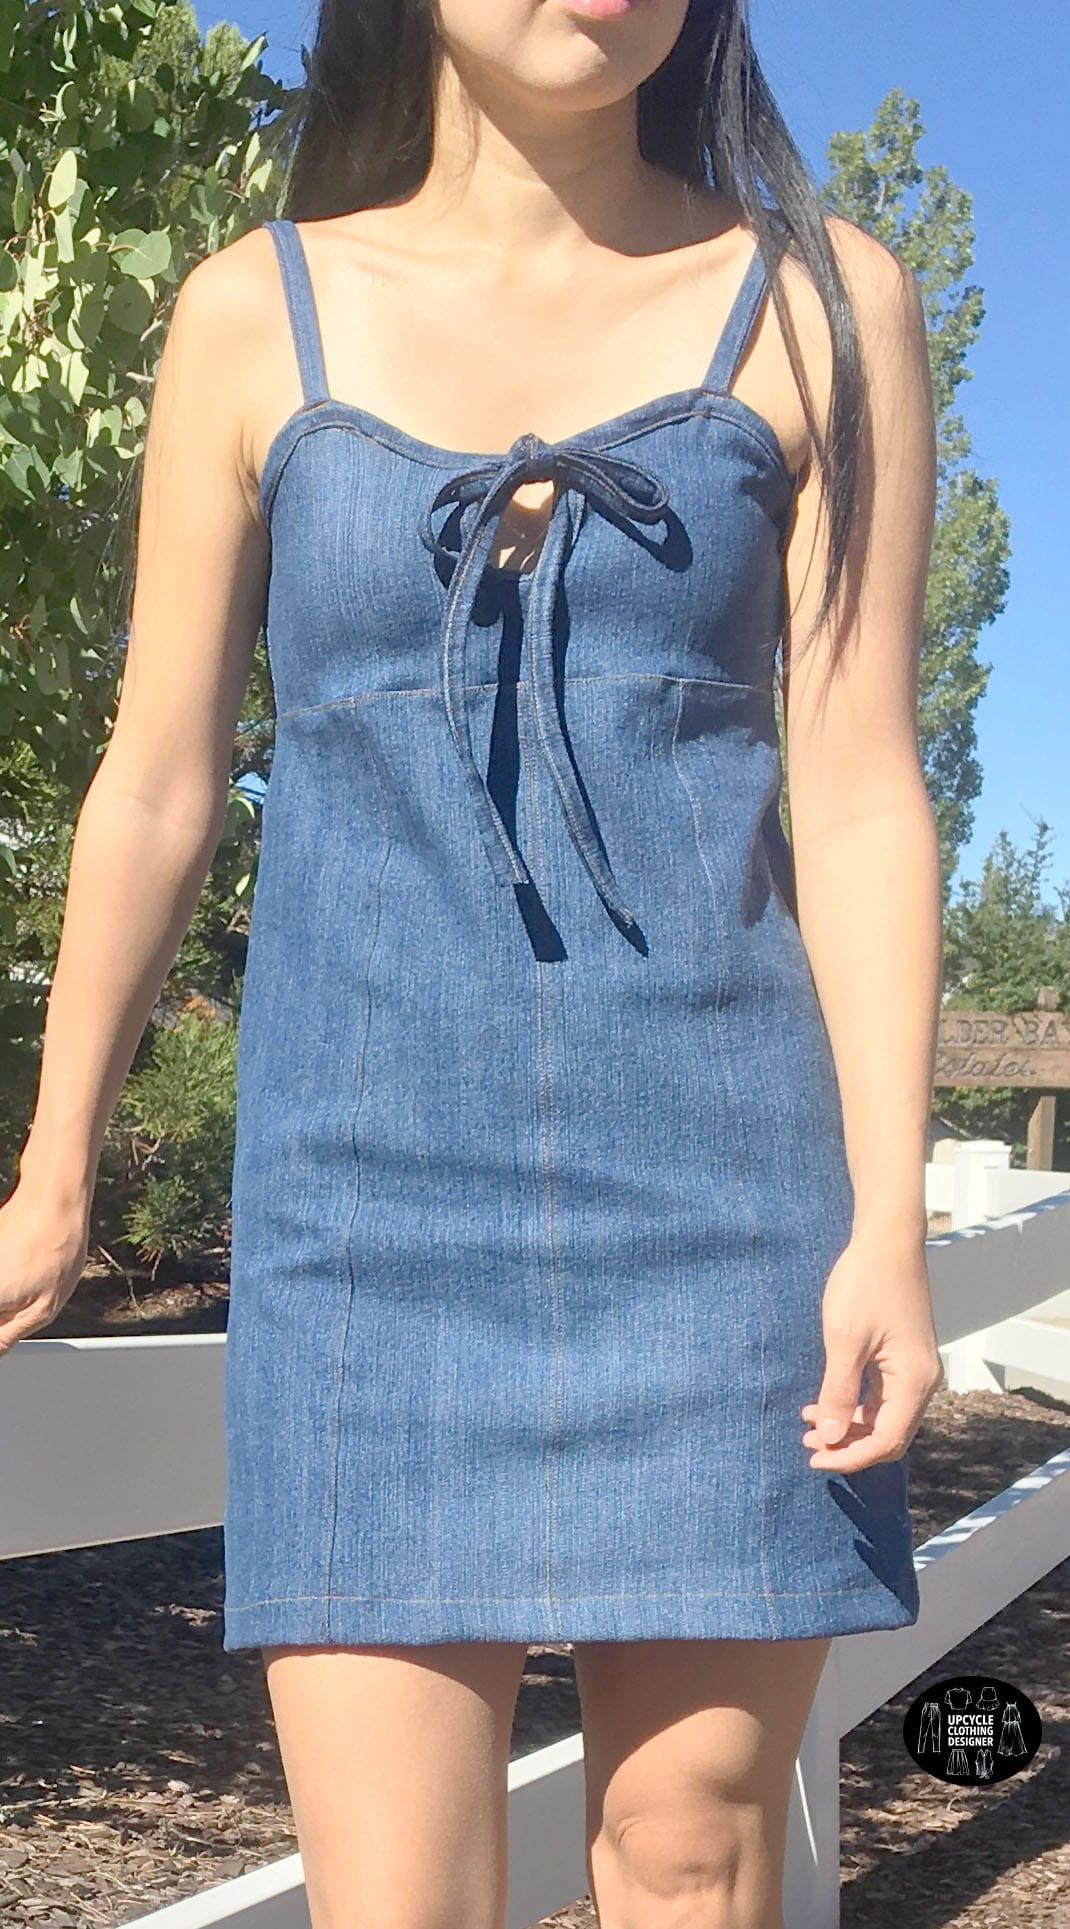 Refashion Denim Mini Dress From Old Jeans